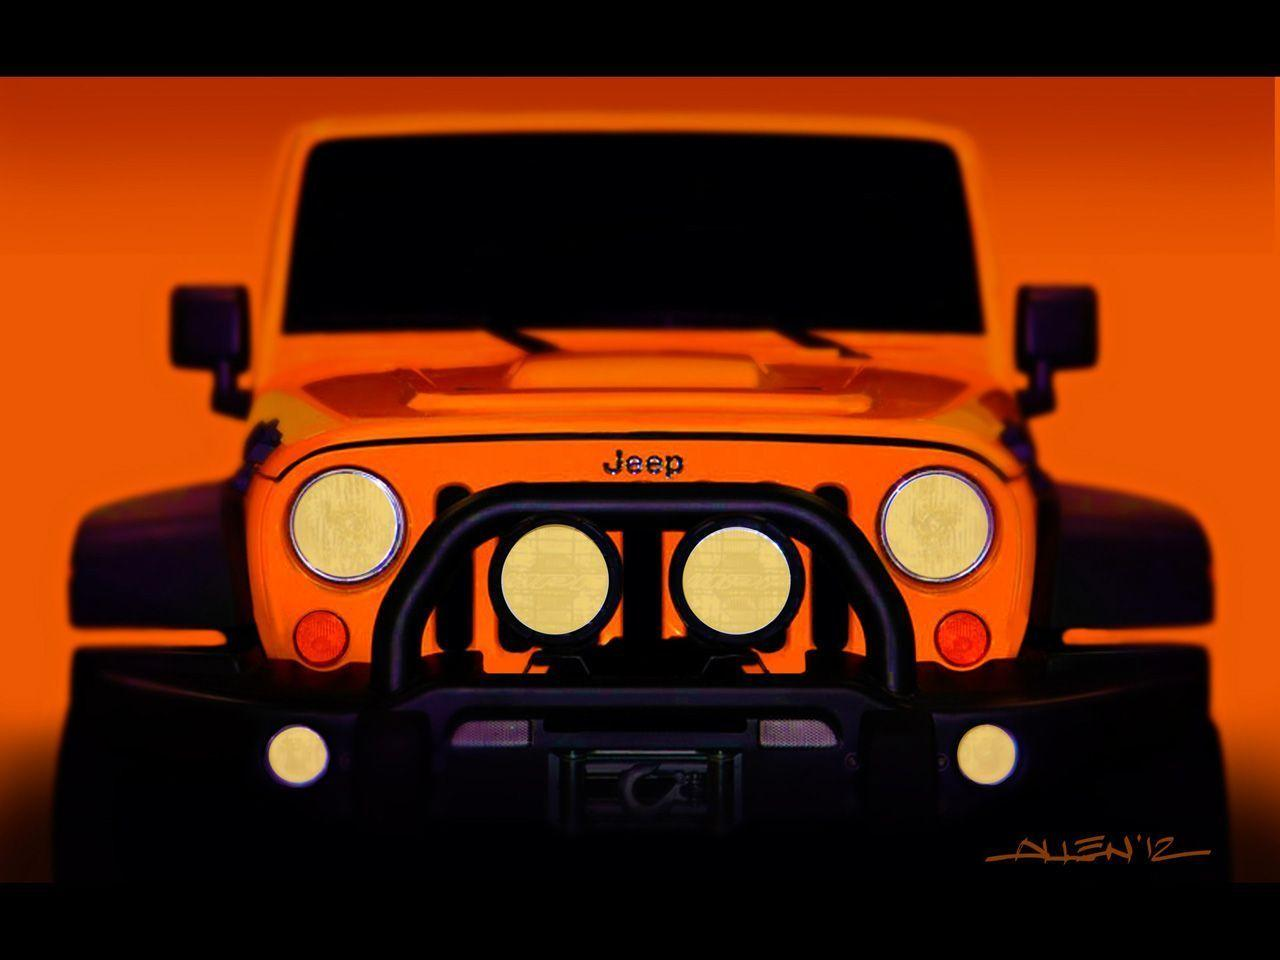 2012 Jeep Moab Easter Safari Concepts - Jeep Wrangler Traildozer ...